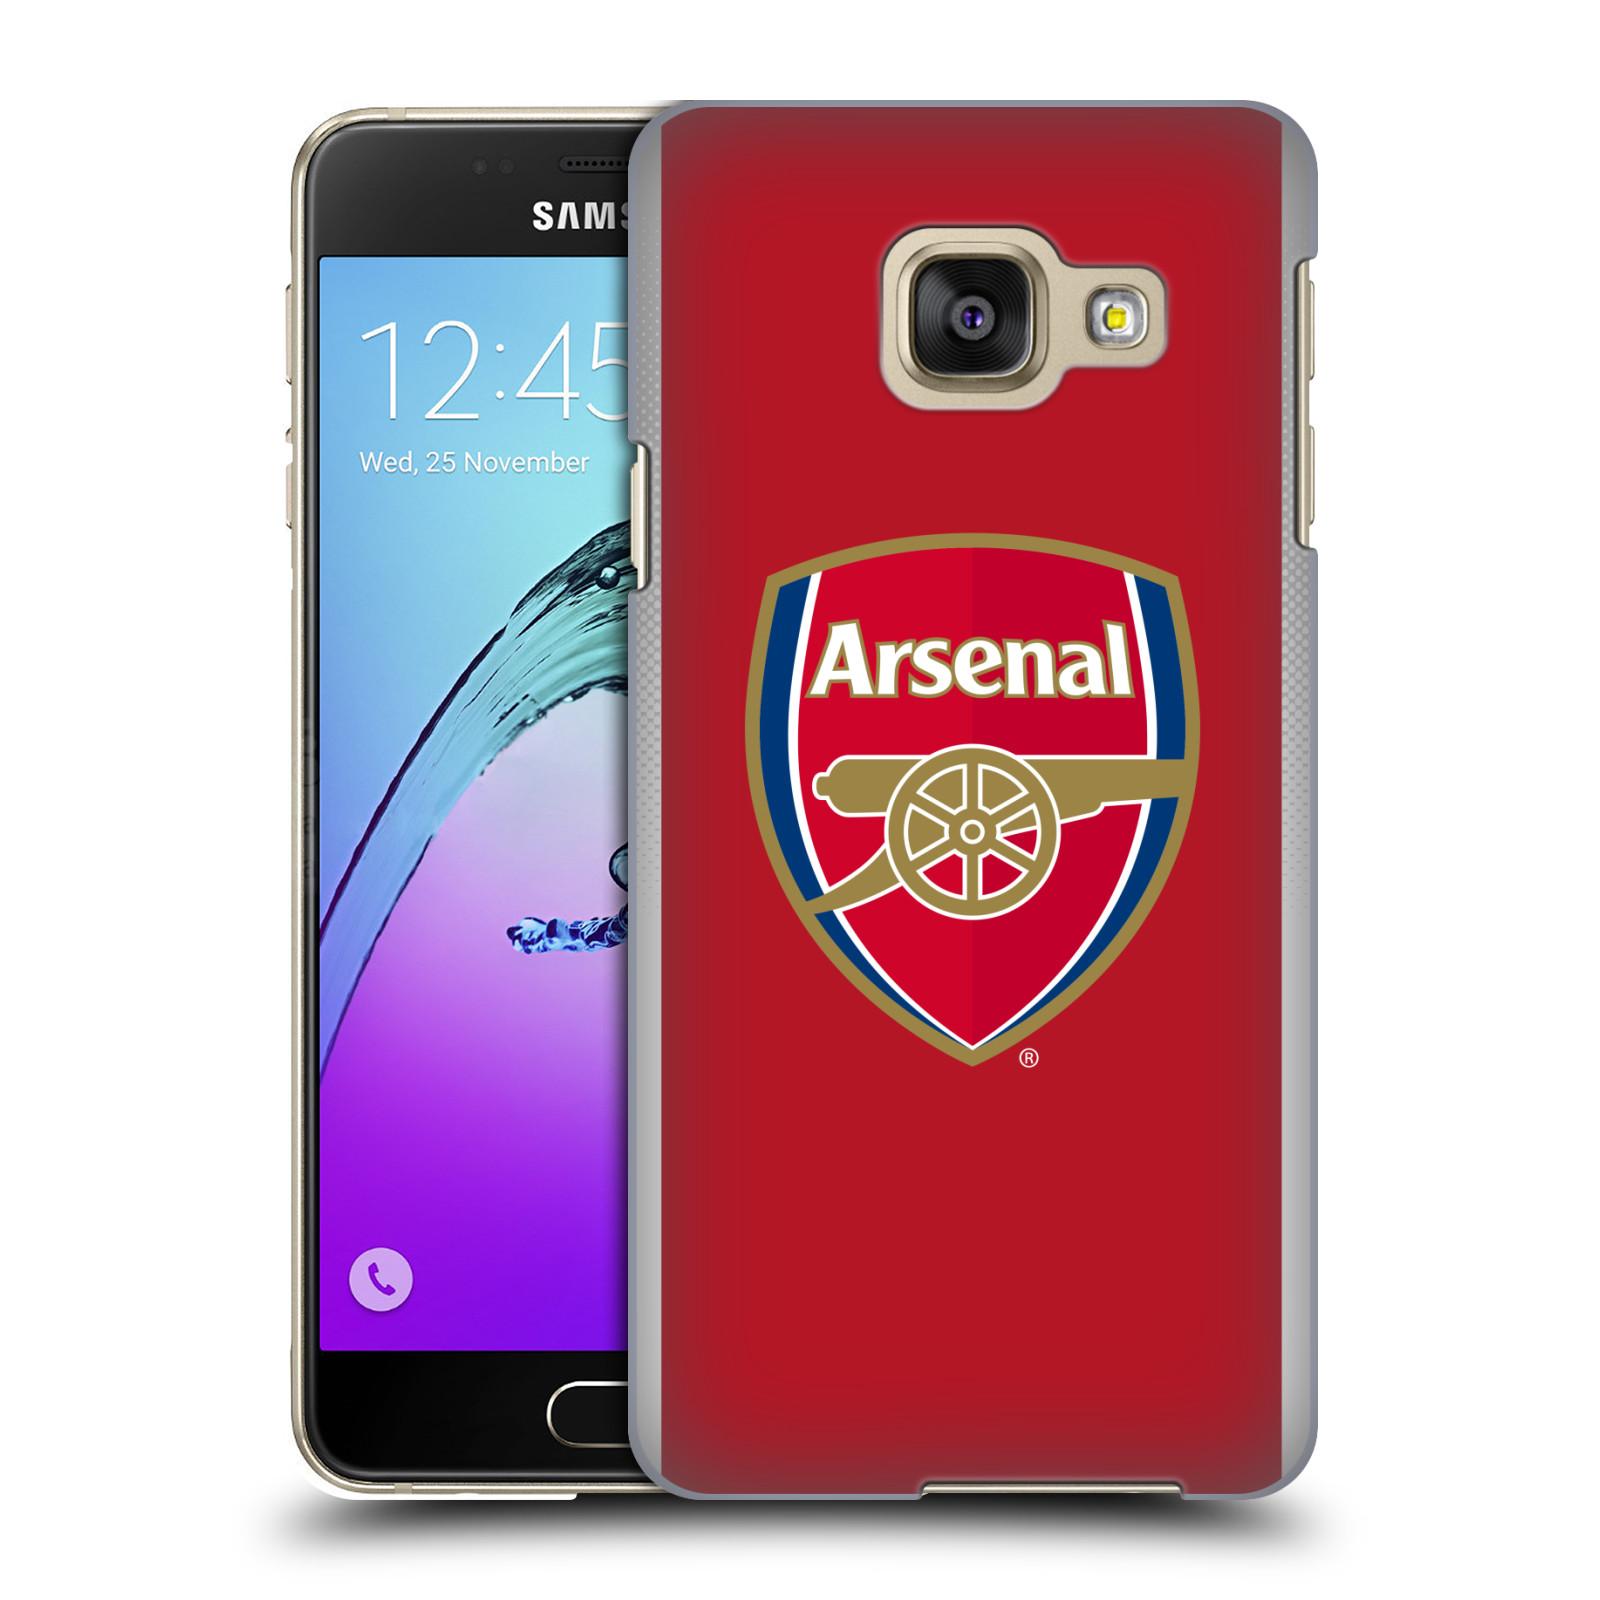 Plastové pouzdro na mobil Samsung Galaxy A3 (2016) - Head Case - Arsenal FC - Logo klubu